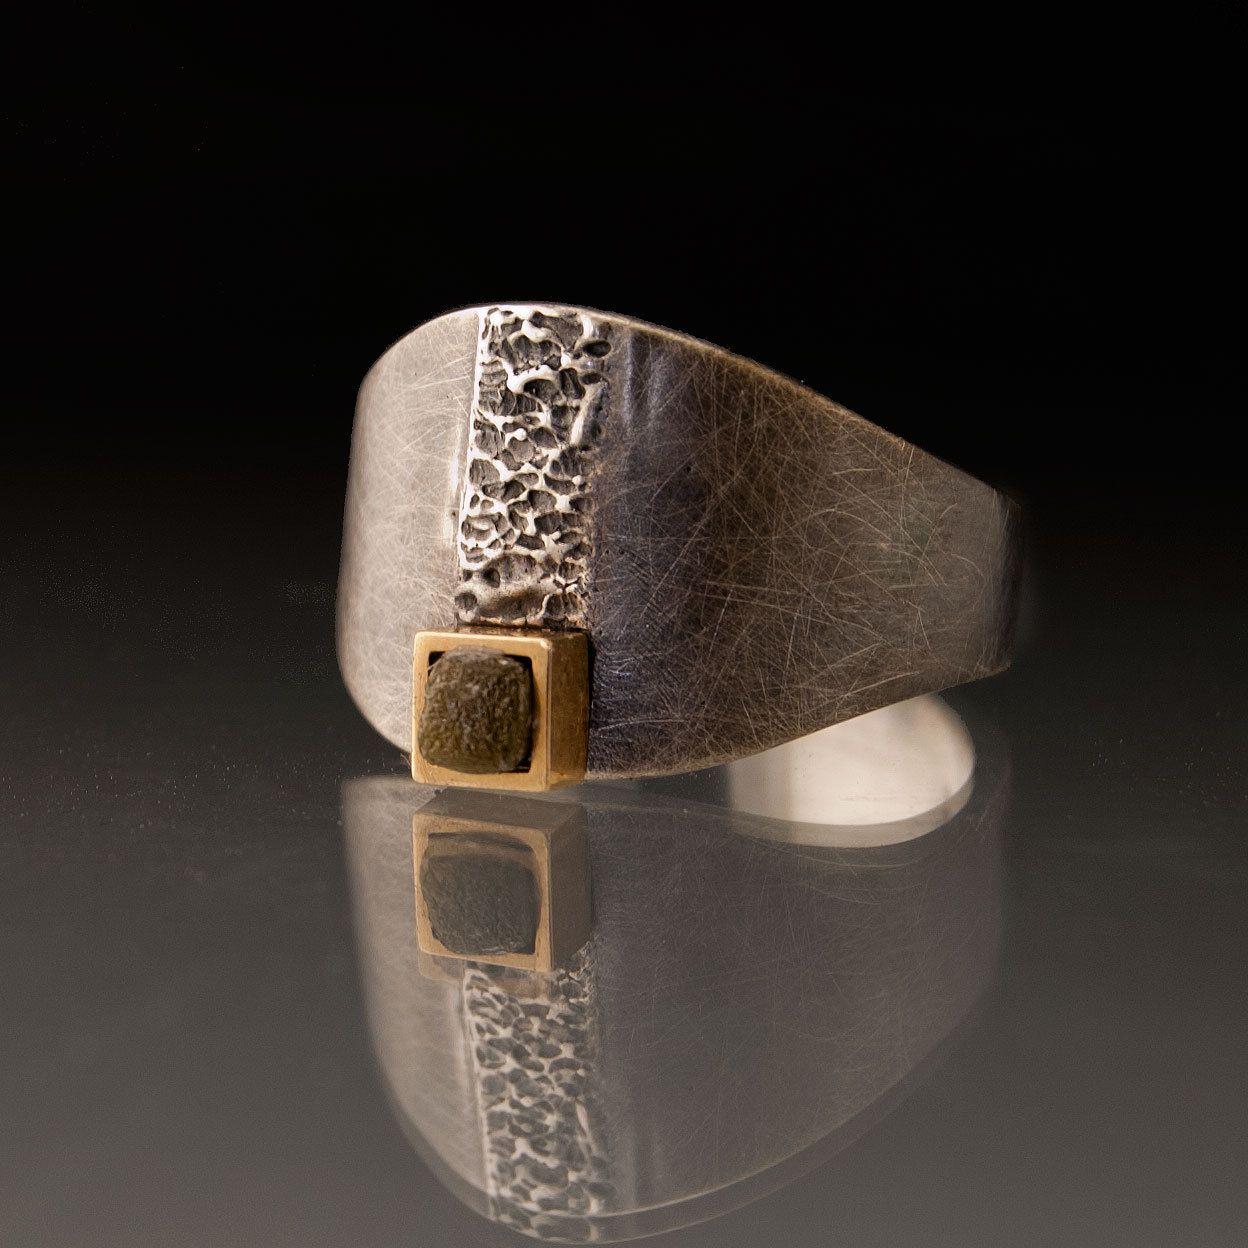 Rough Diamond 14k Yellow Gold Square Bezel Sterling Silver Ring - Textured Raw Diamond Cube Amor Ring via Etsy.